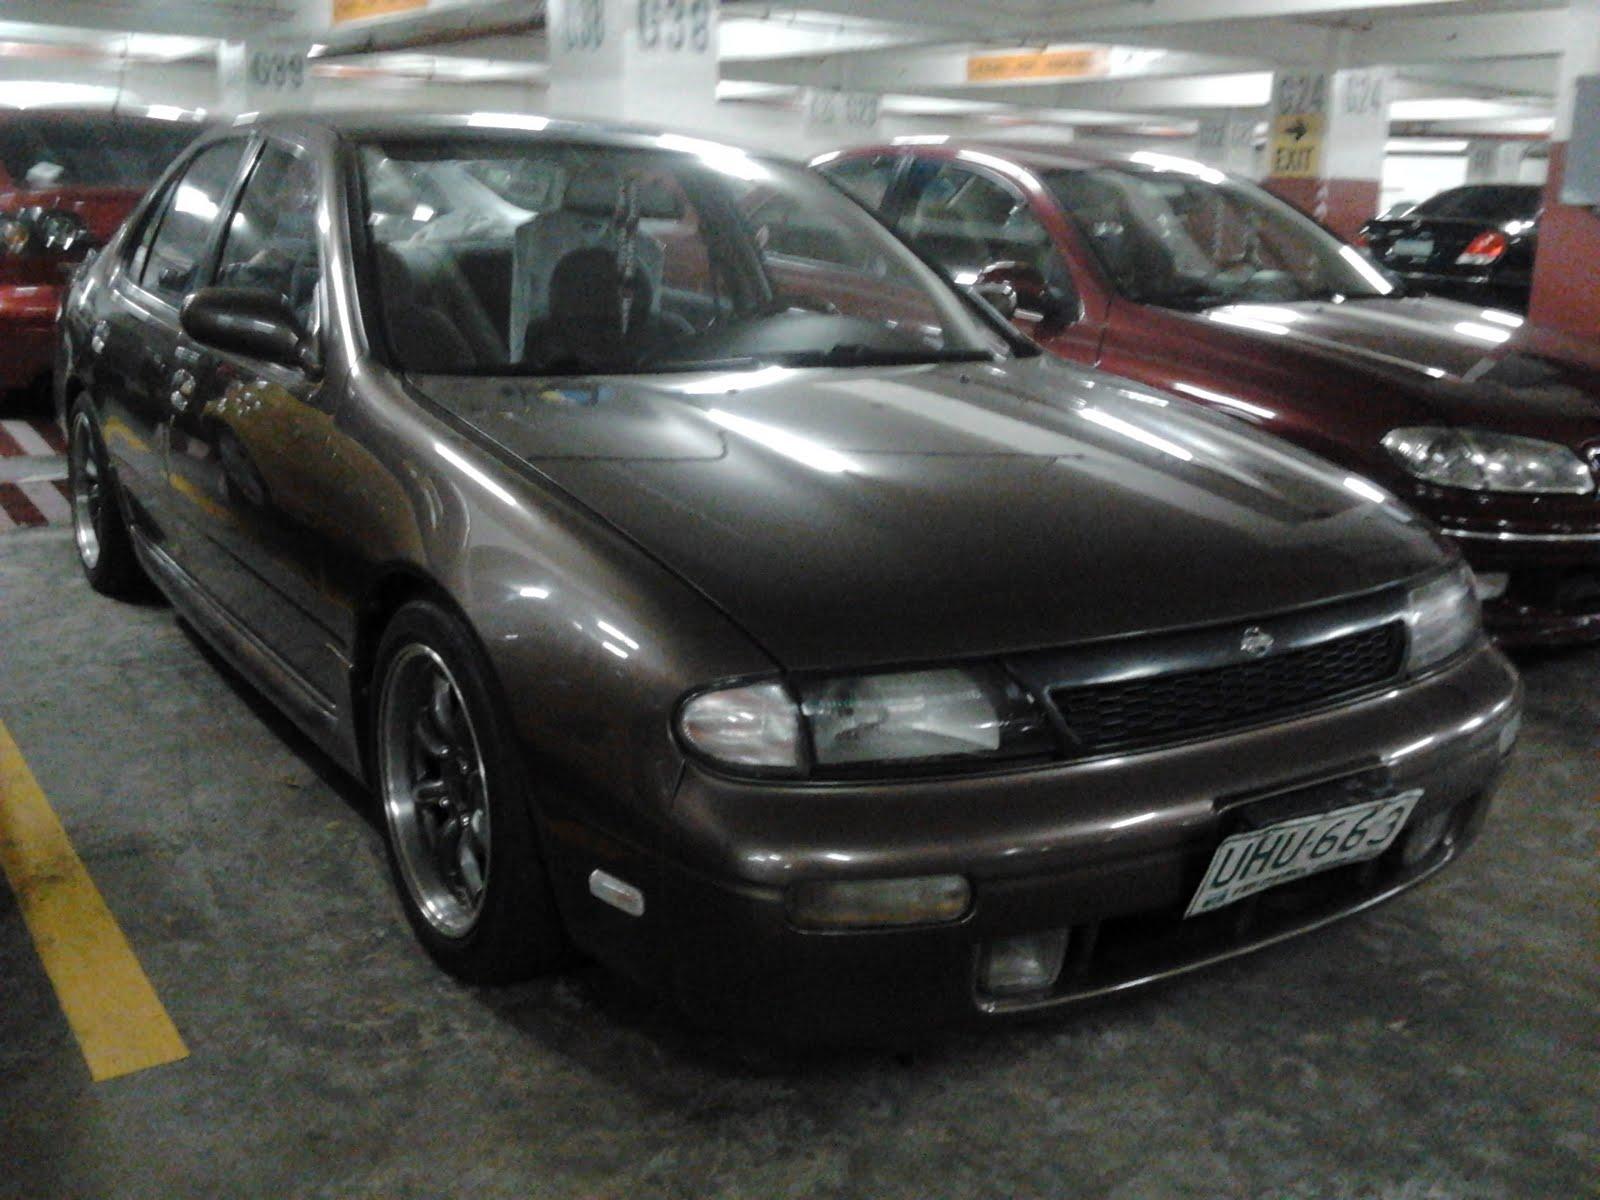 parked cars manila: 1995 nissan altima